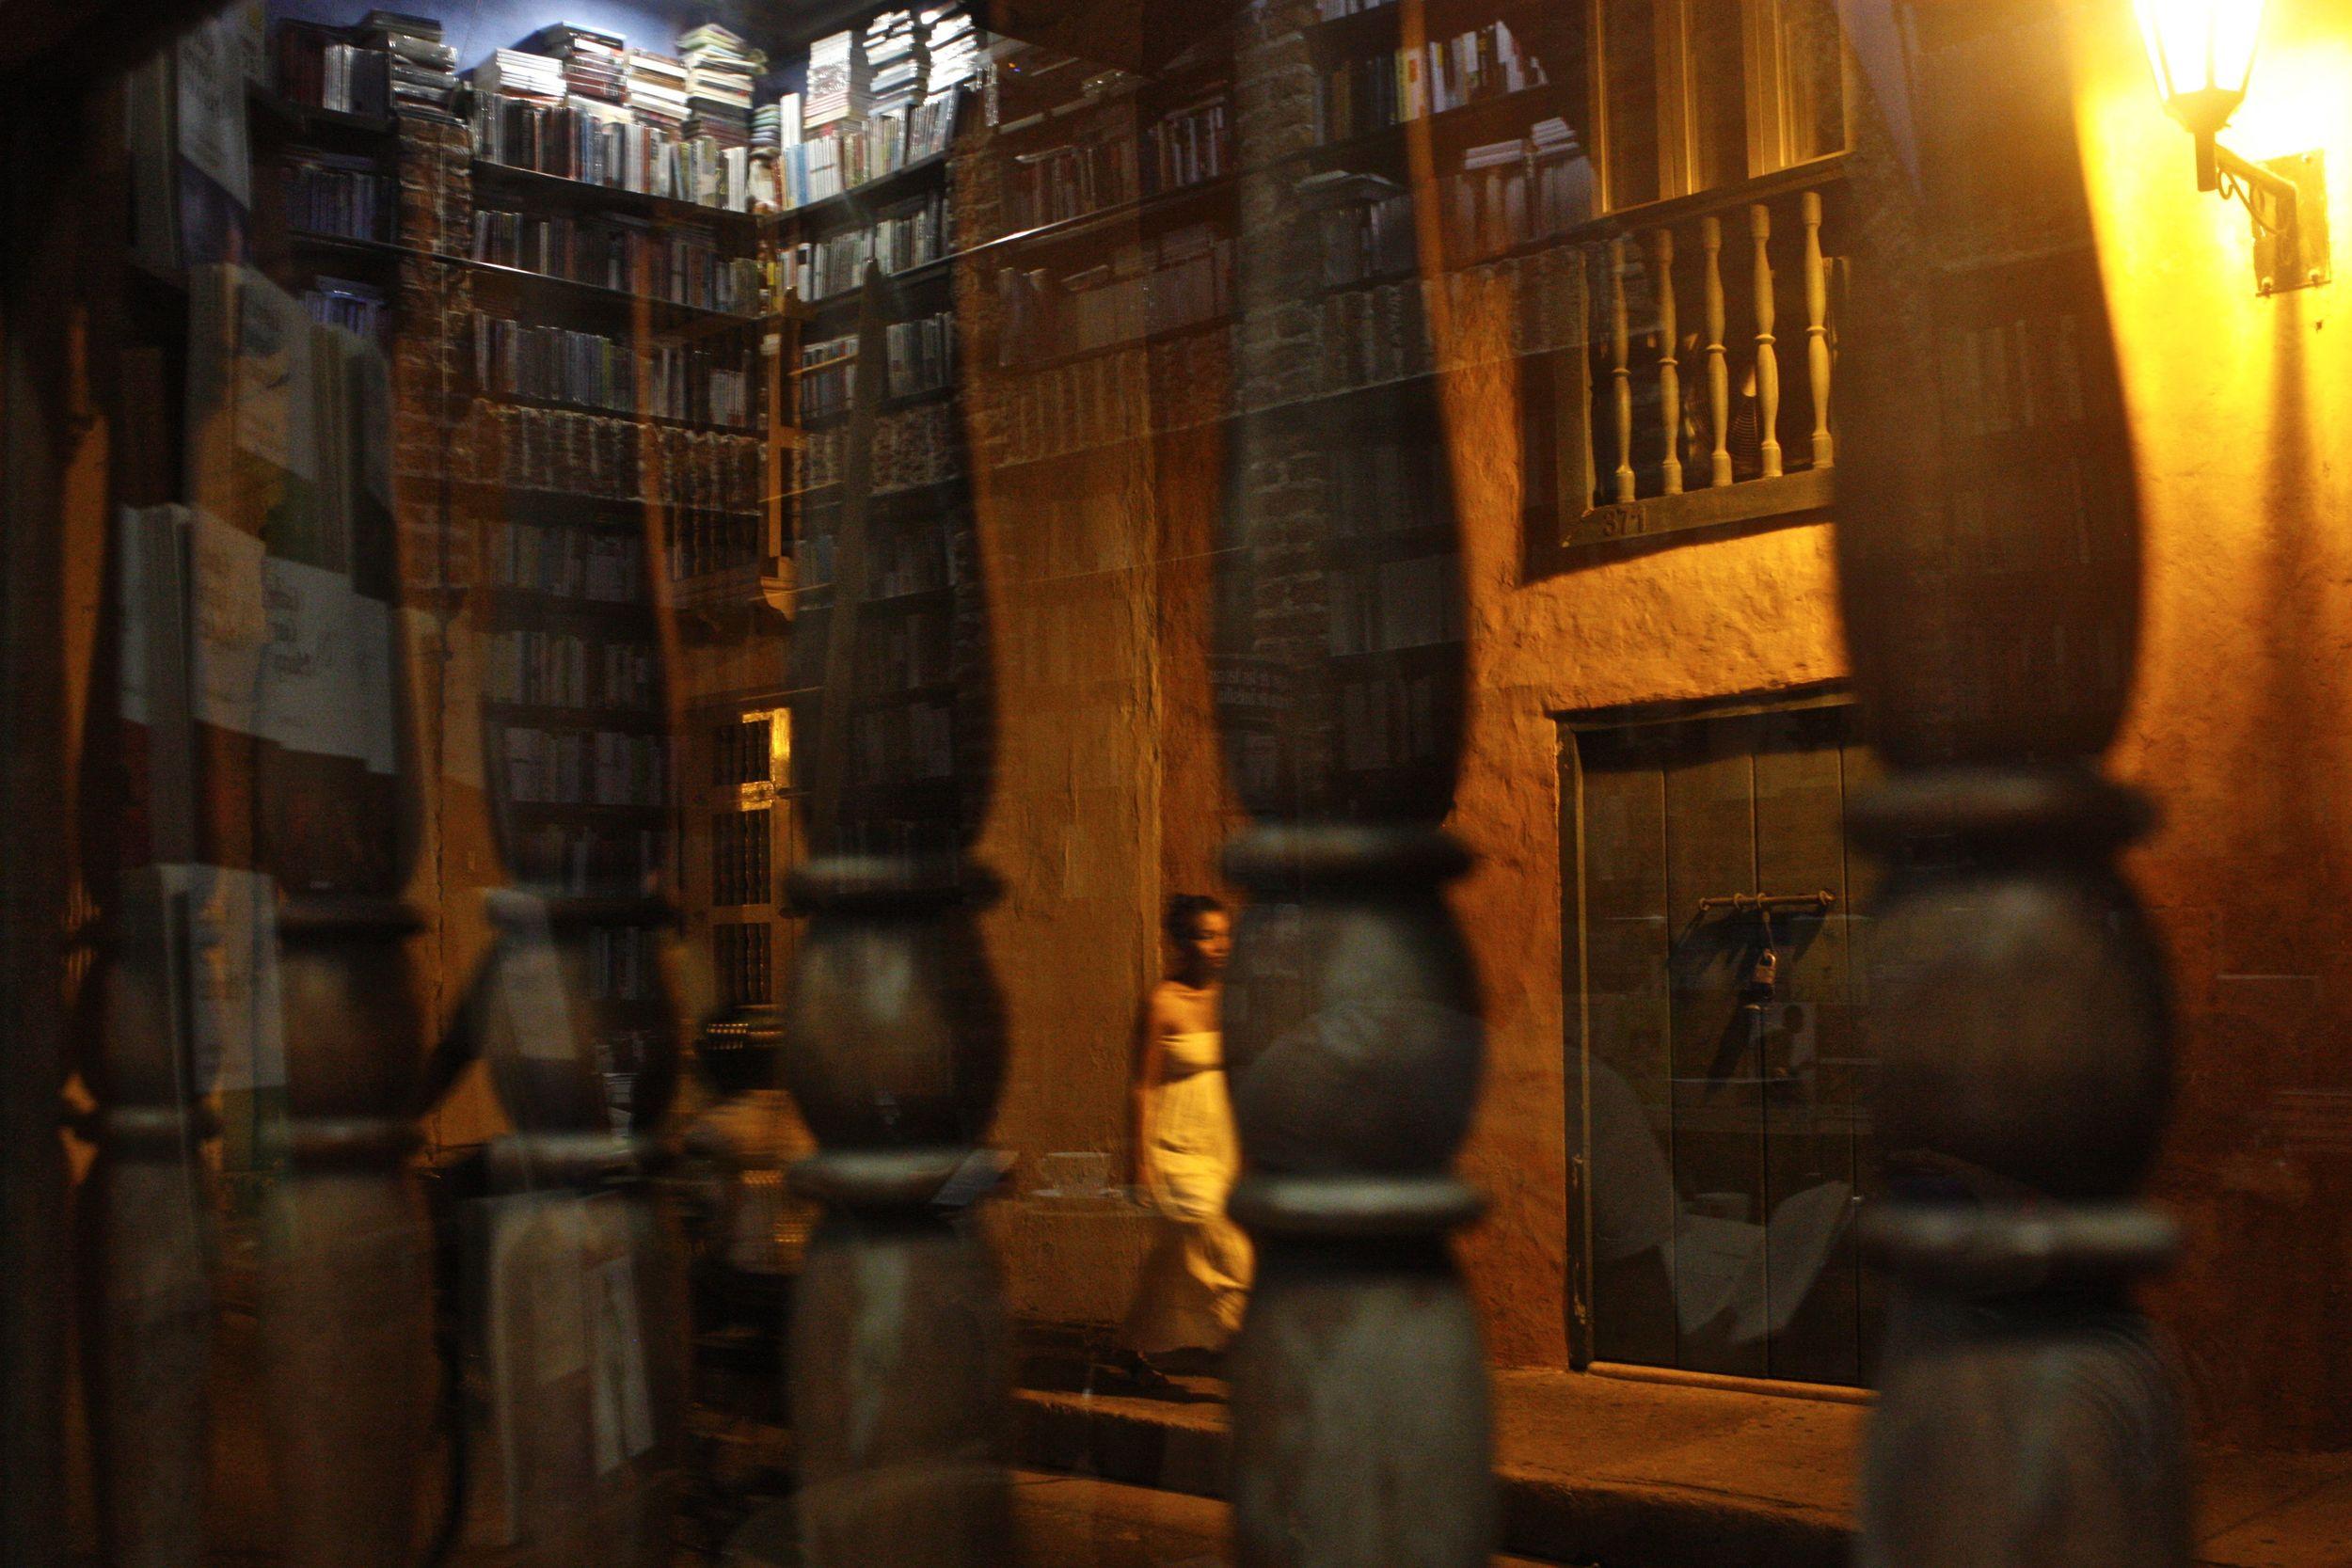 inside bookstore.jpg